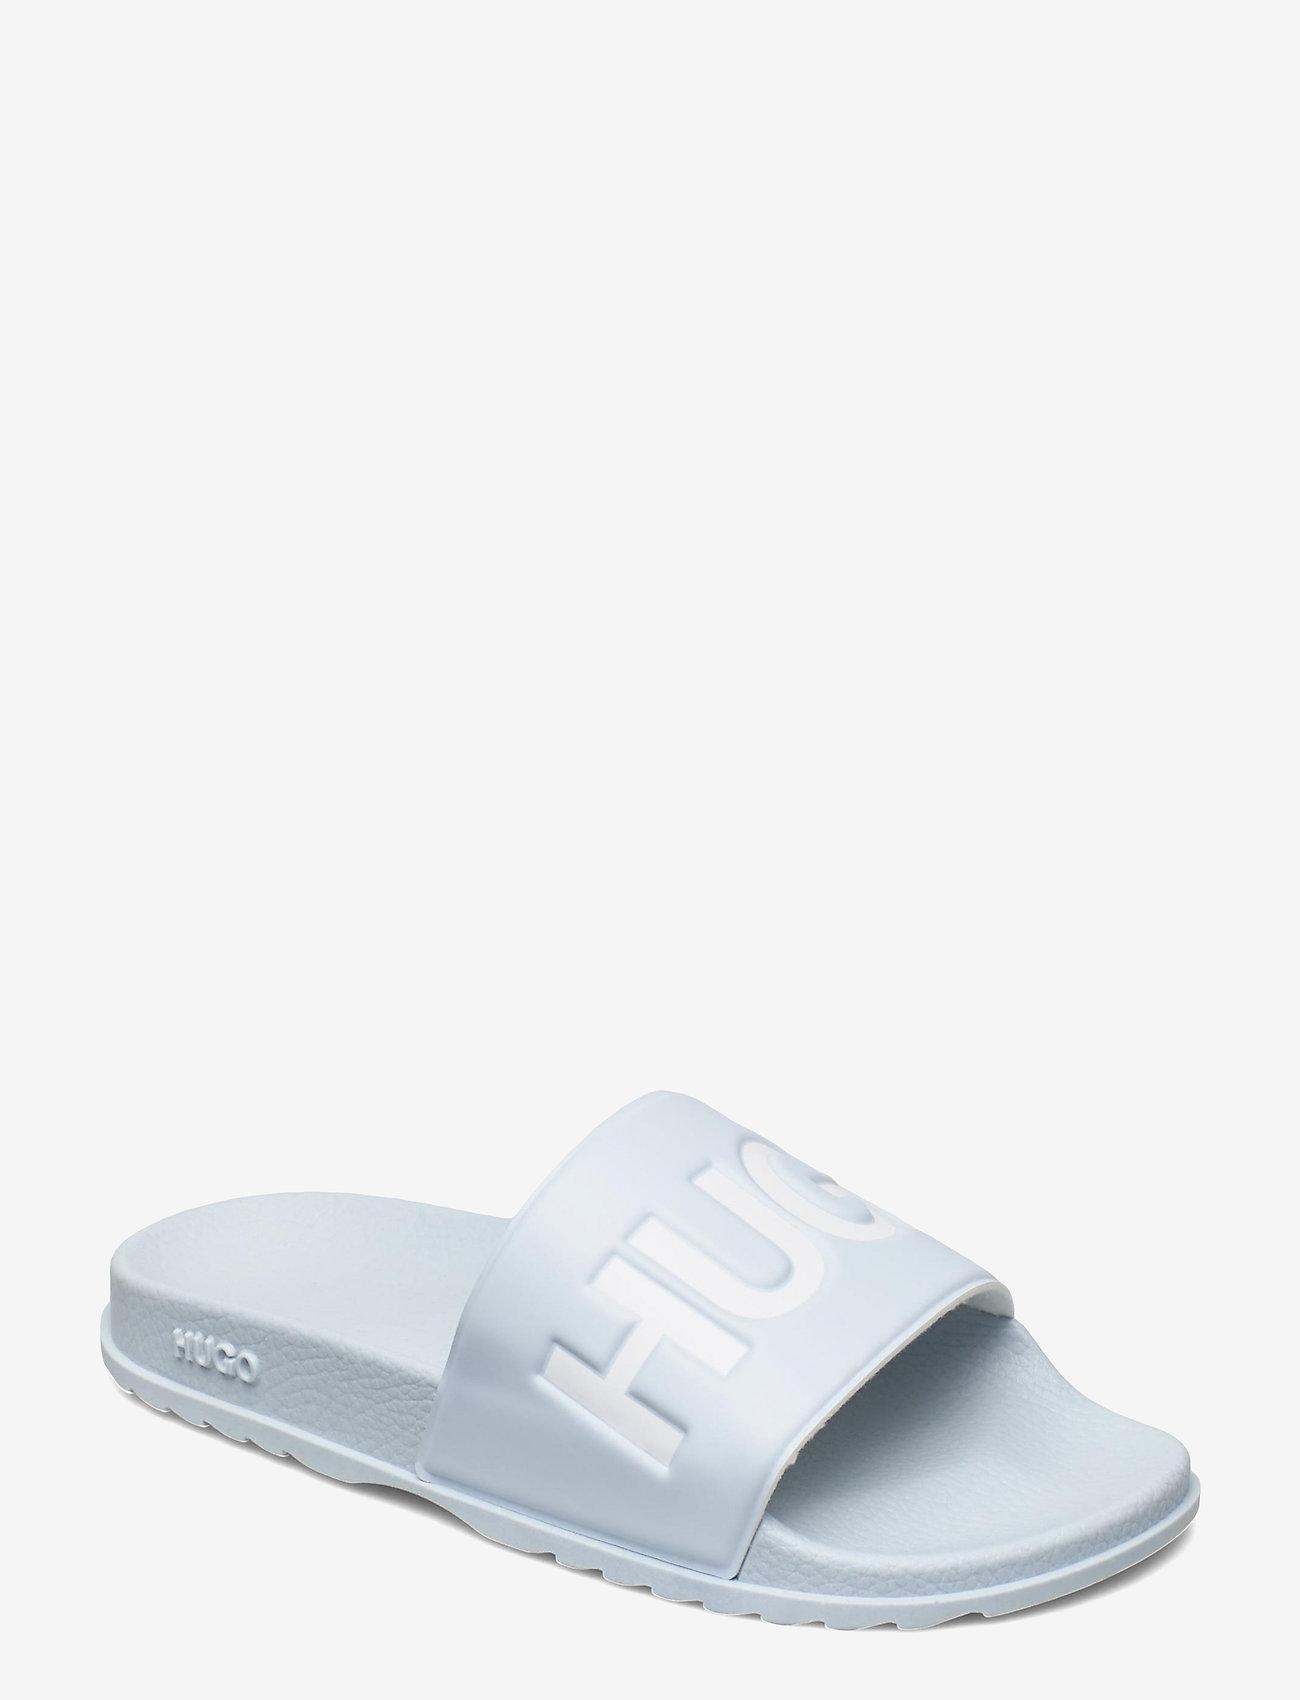 HUGO - Match_Slid_rblg - sandales de bain - light/pastel blue - 0